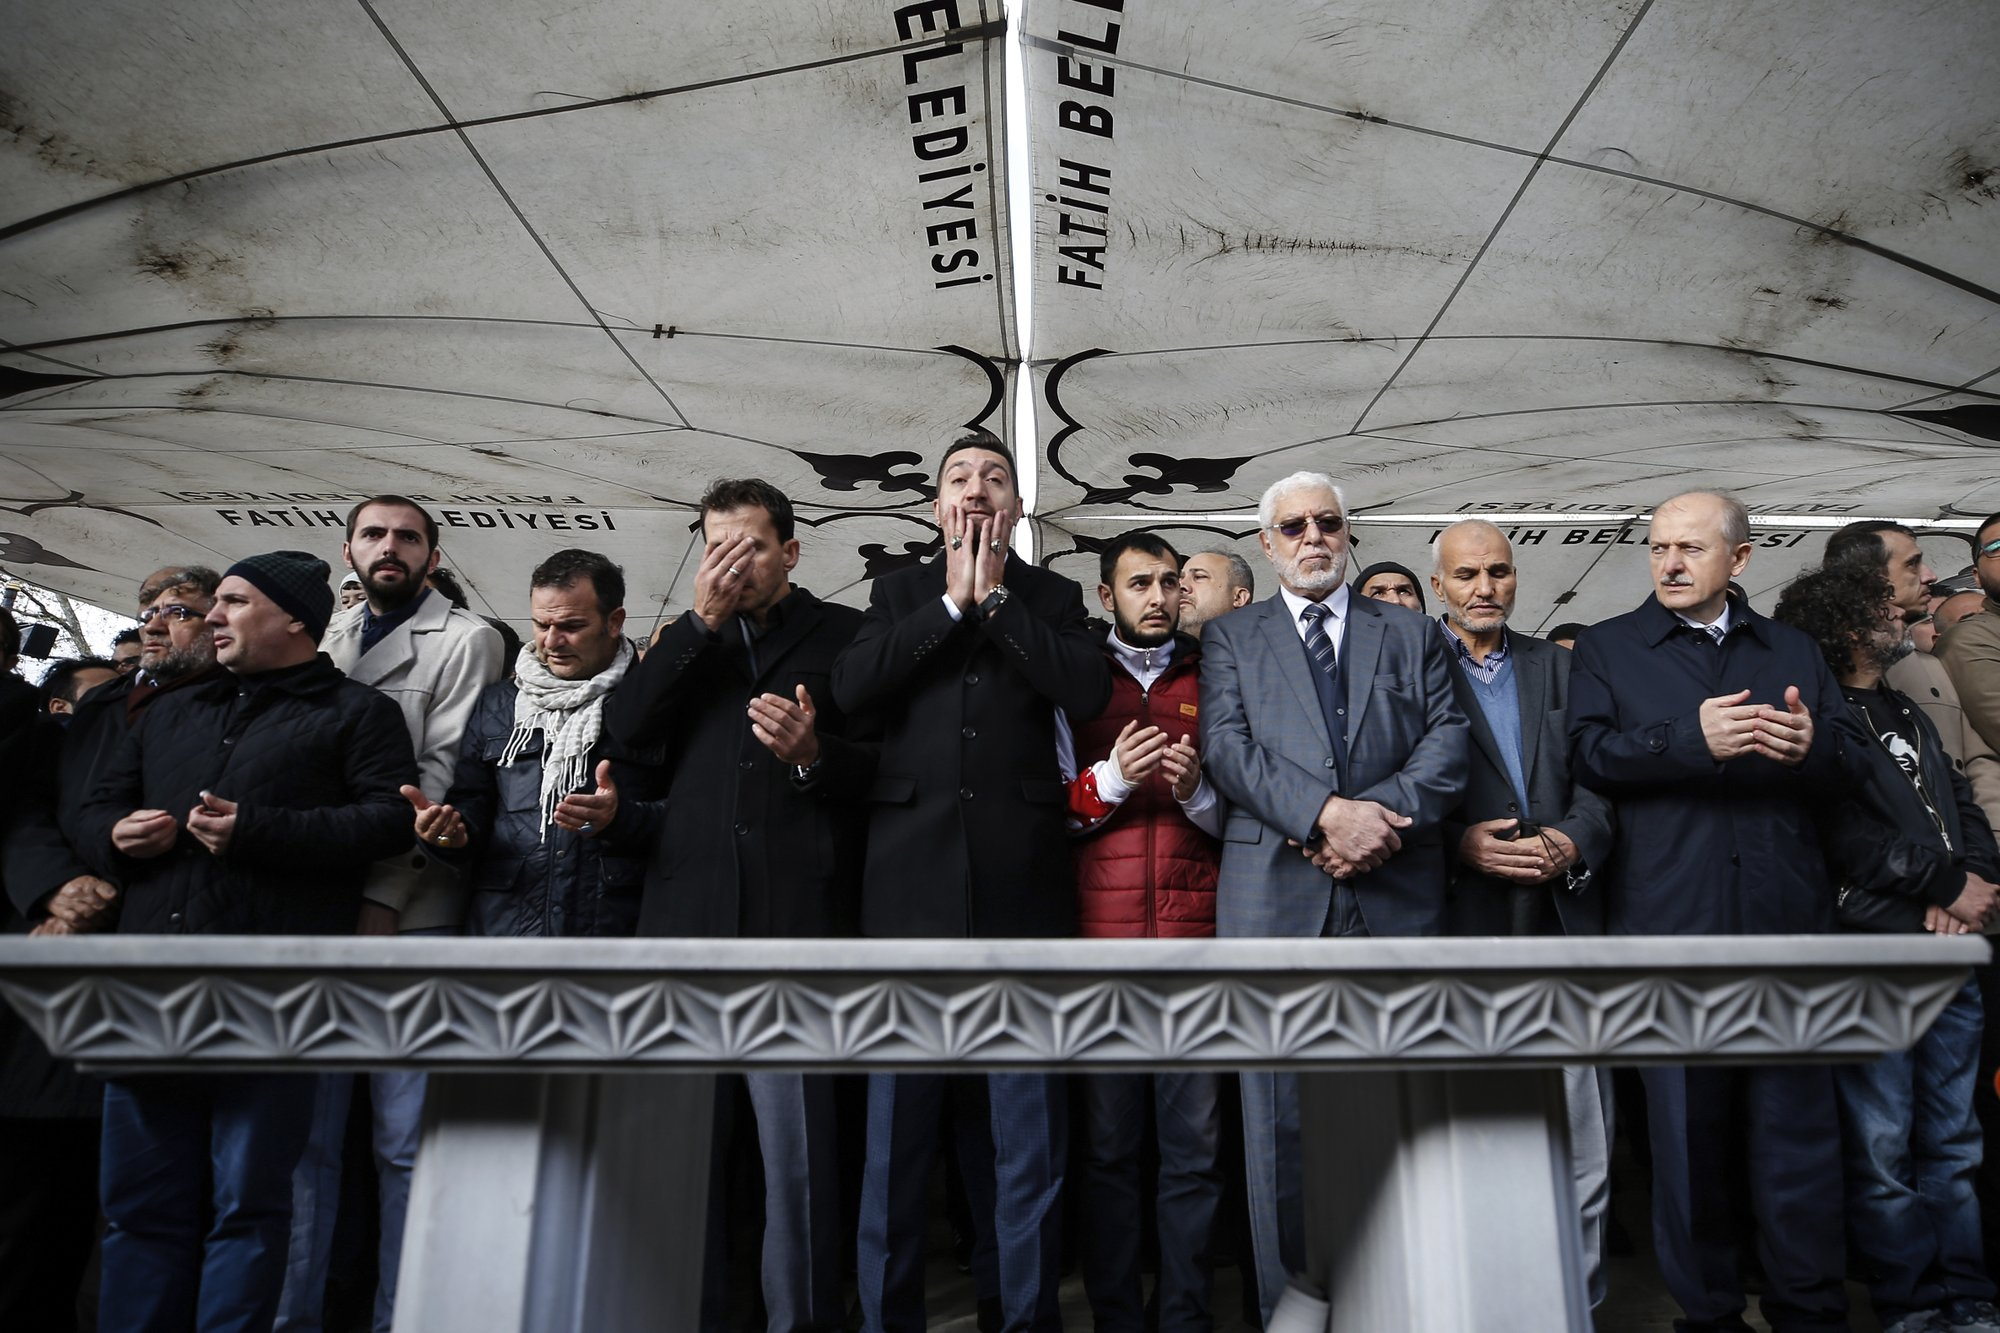 apnews.com - The Latest: US intel says prince ordered Khashoggi killing